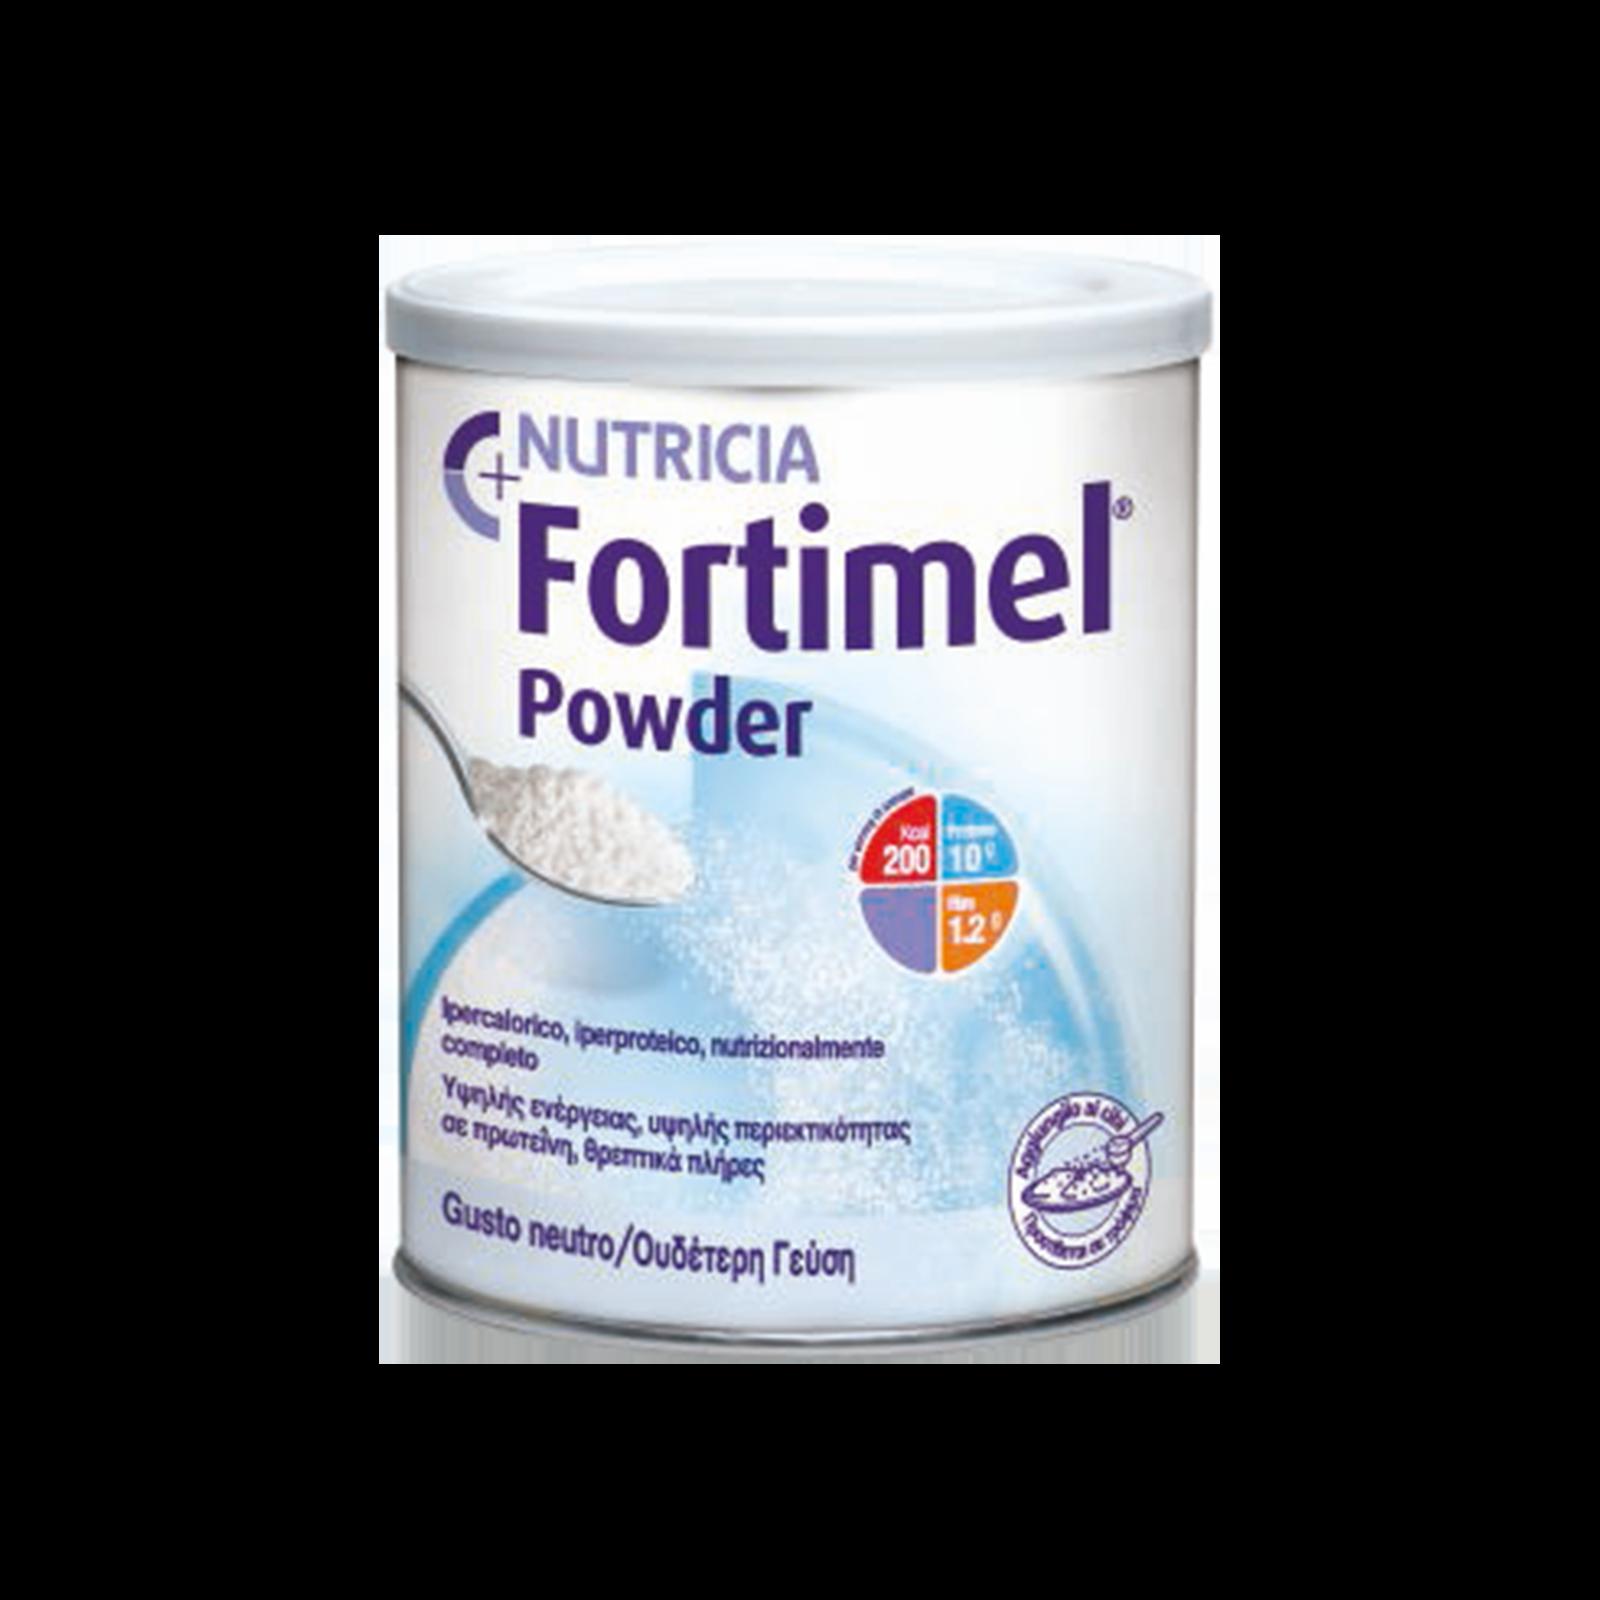 Fortimel Powder Neutro 12x Barattolo 335 g | Nutricia